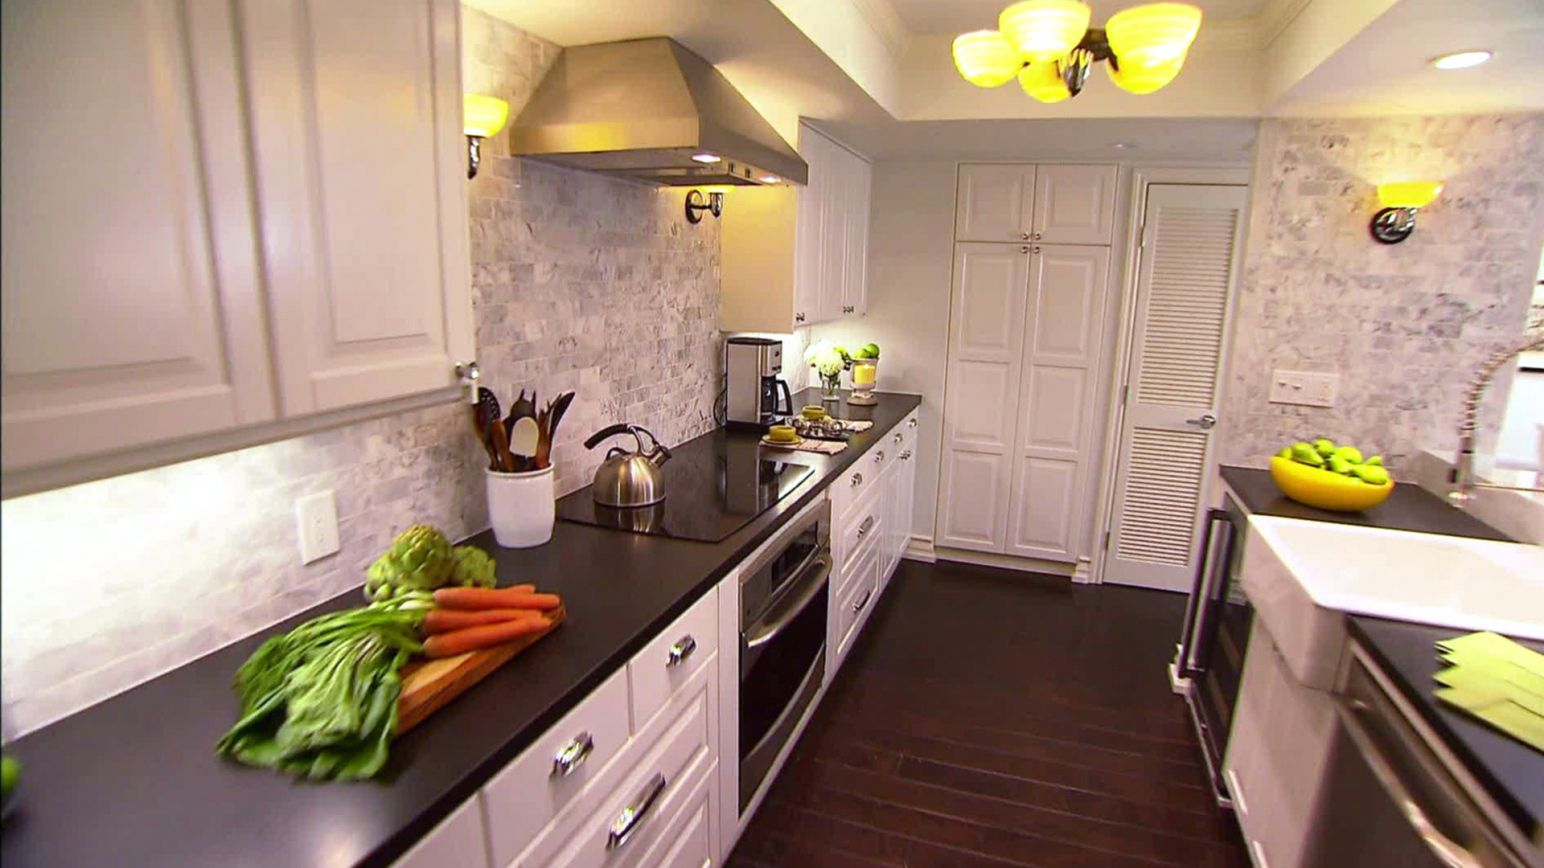 100 condo kitchens makeover kitchen decor ideas on a budget check